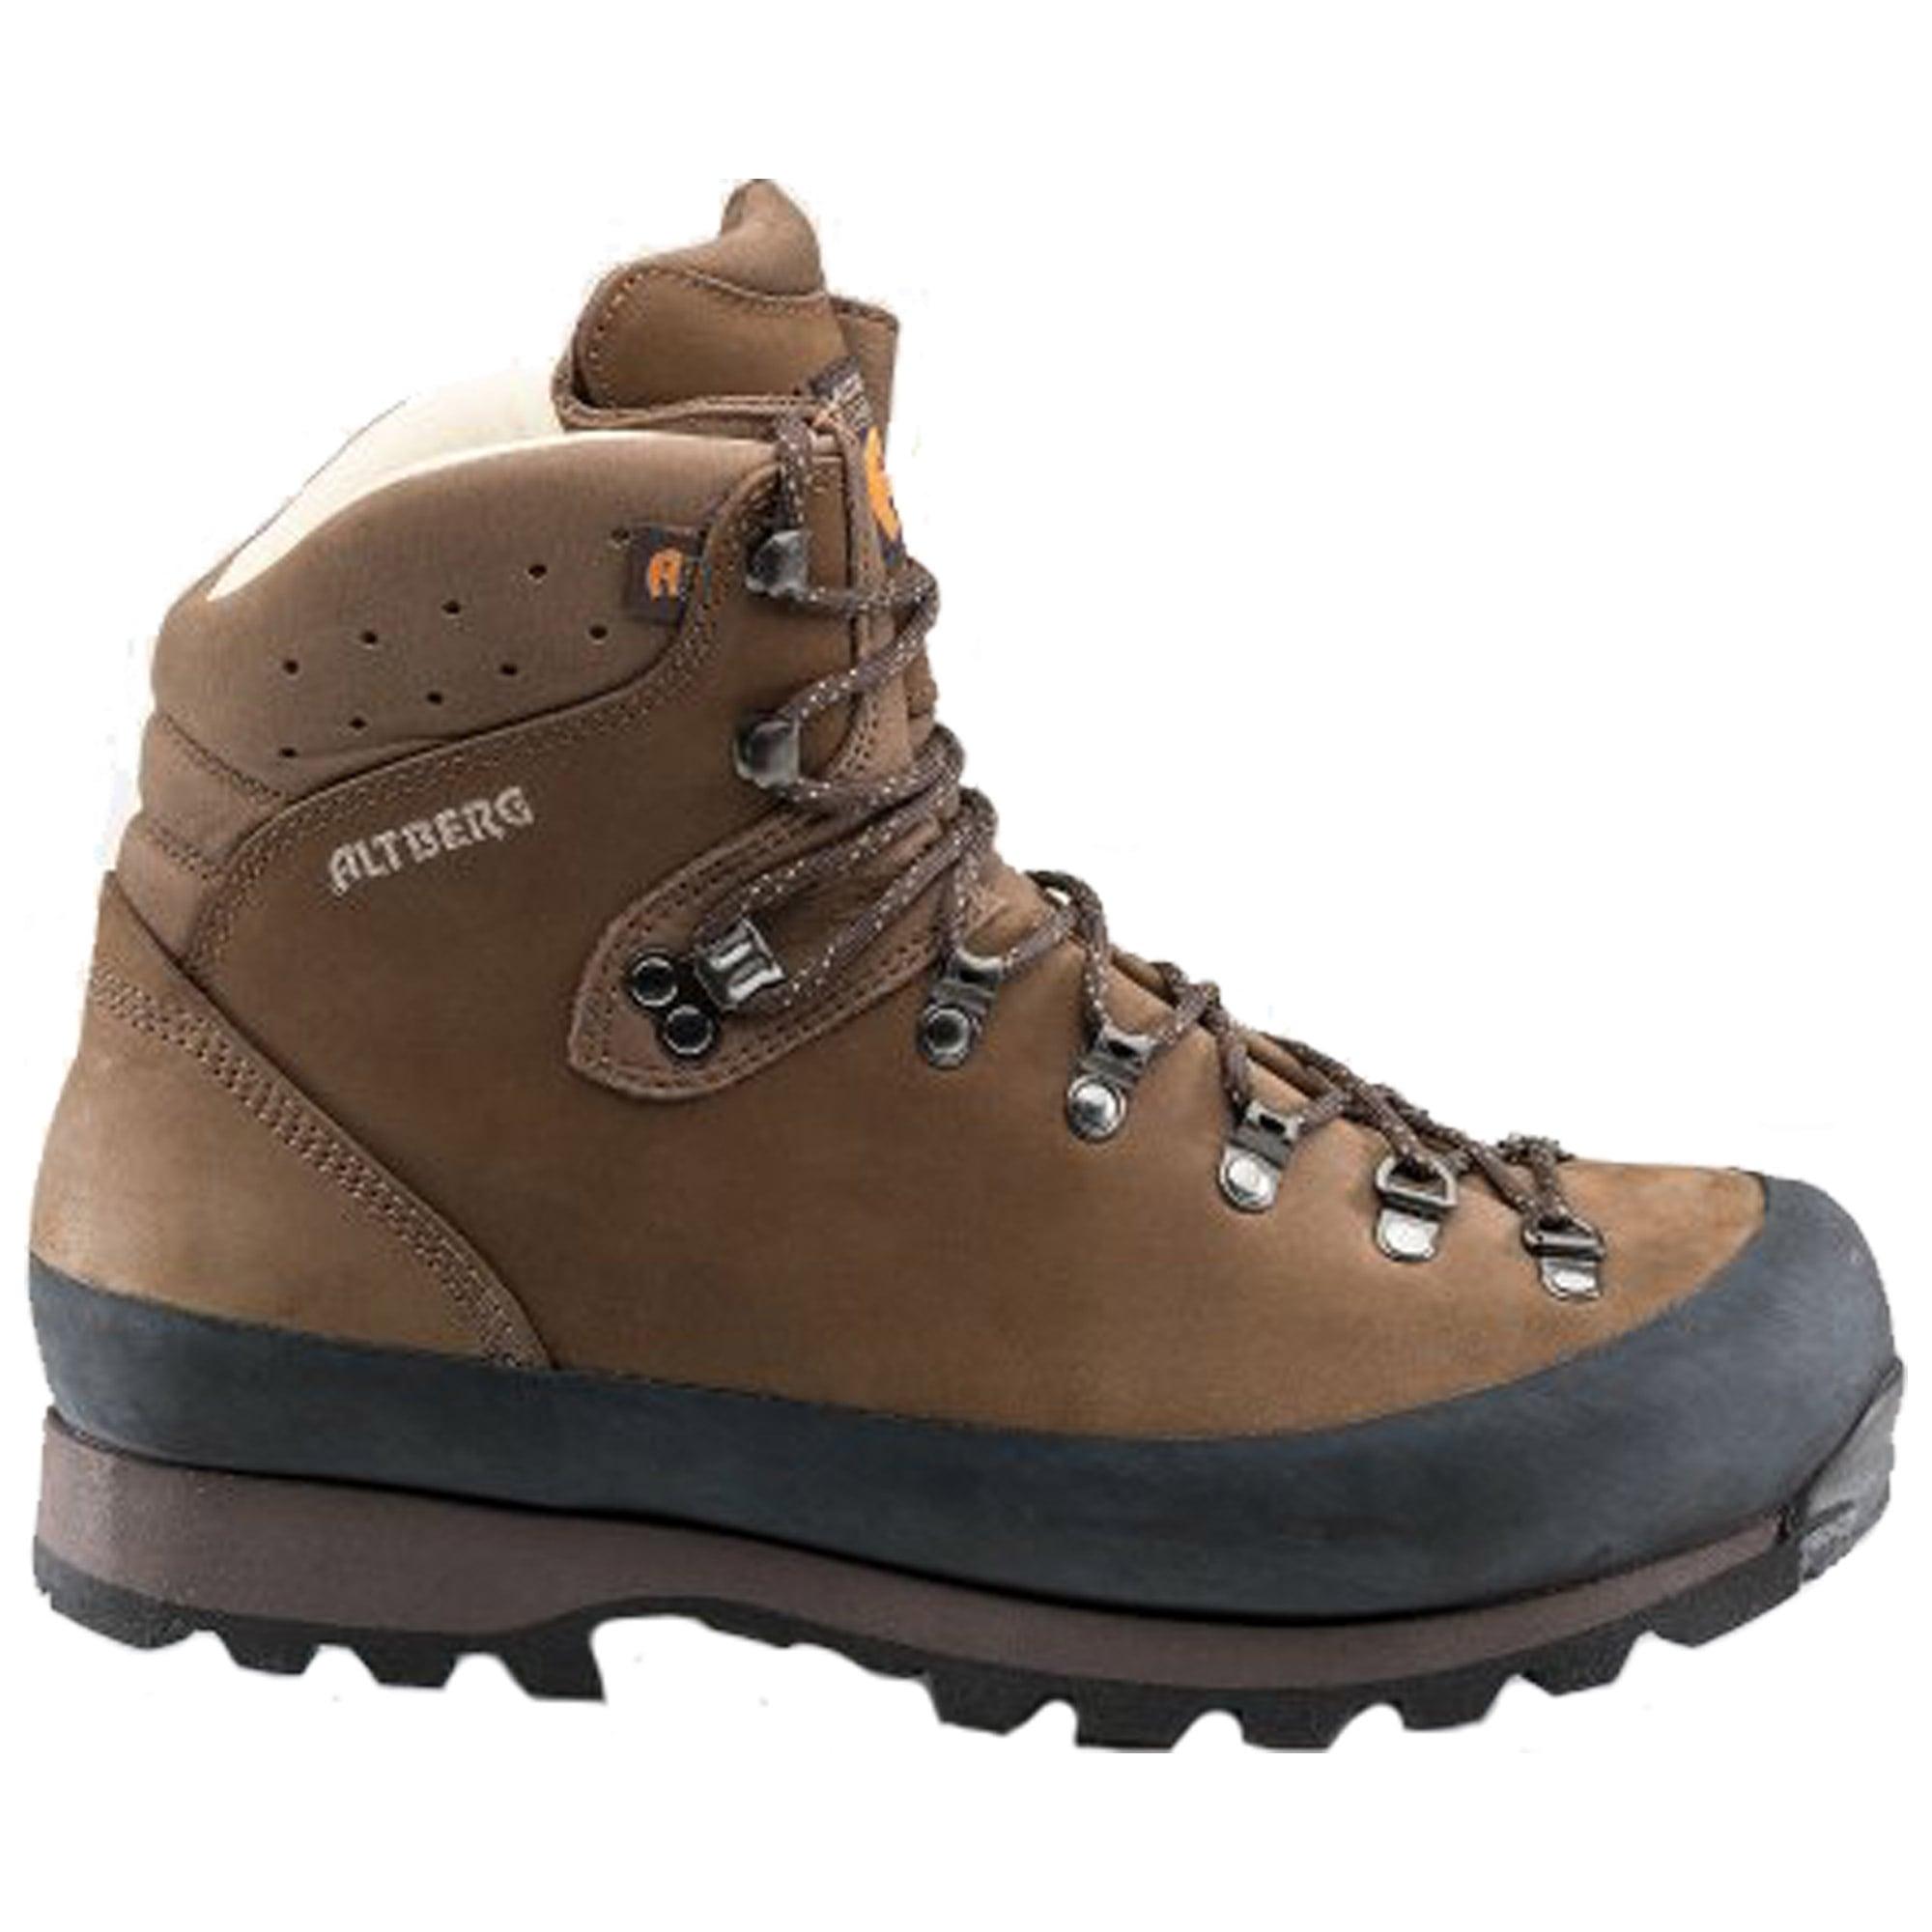 Altberg Mens Nordkapp Walking Boots - Footwear from Gaynor Sports UK